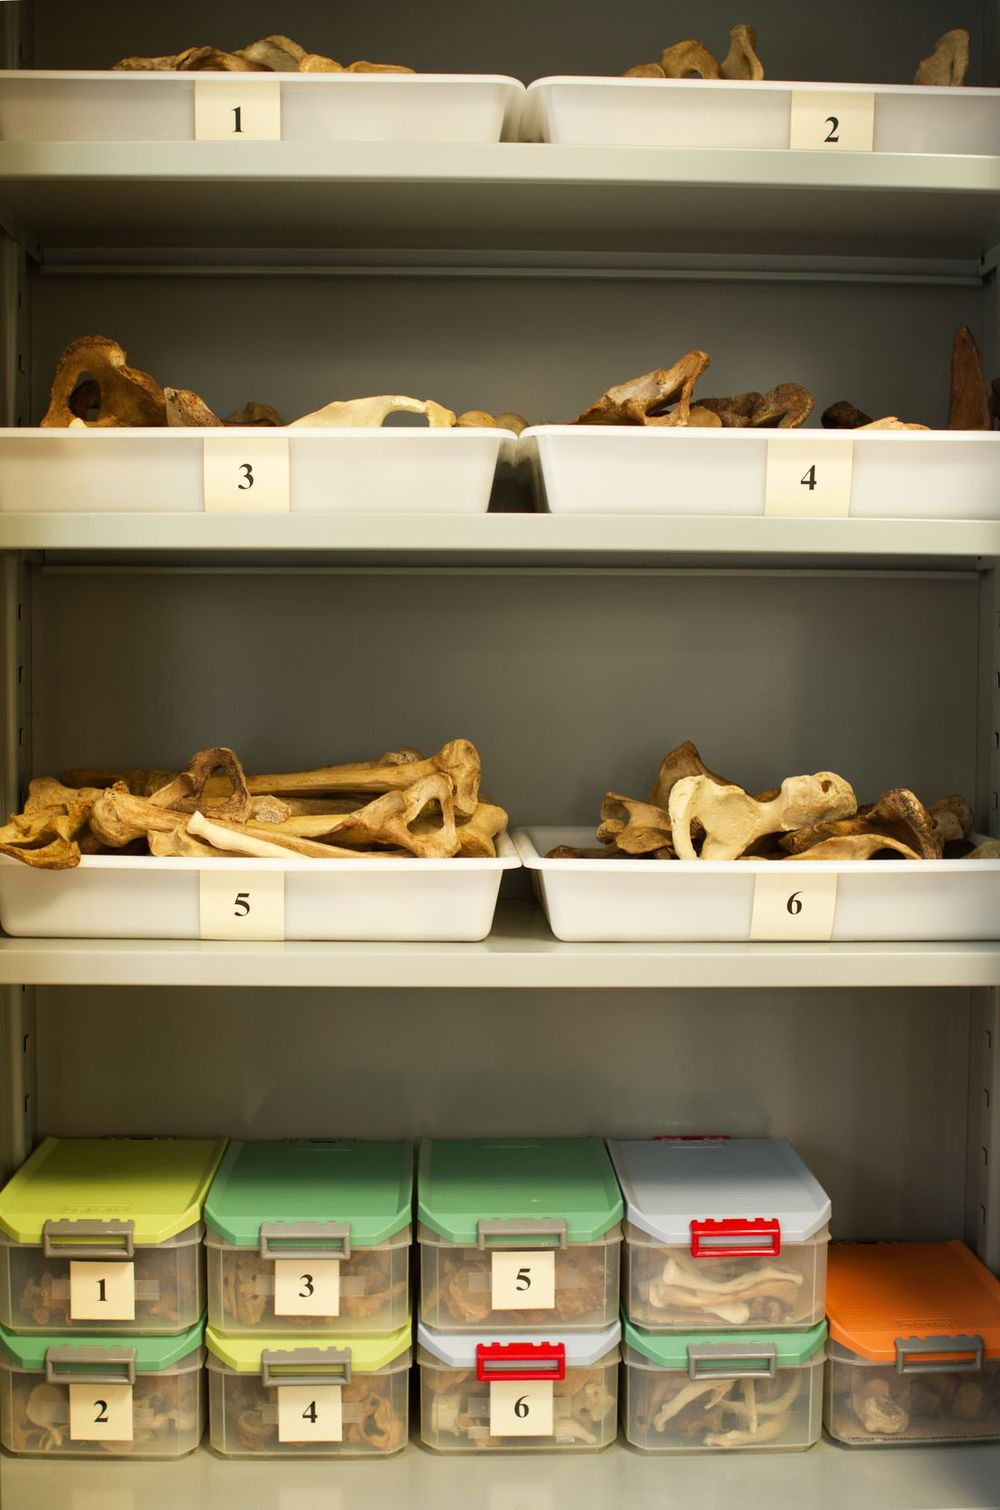 huesos anatomia 1_result.jpg